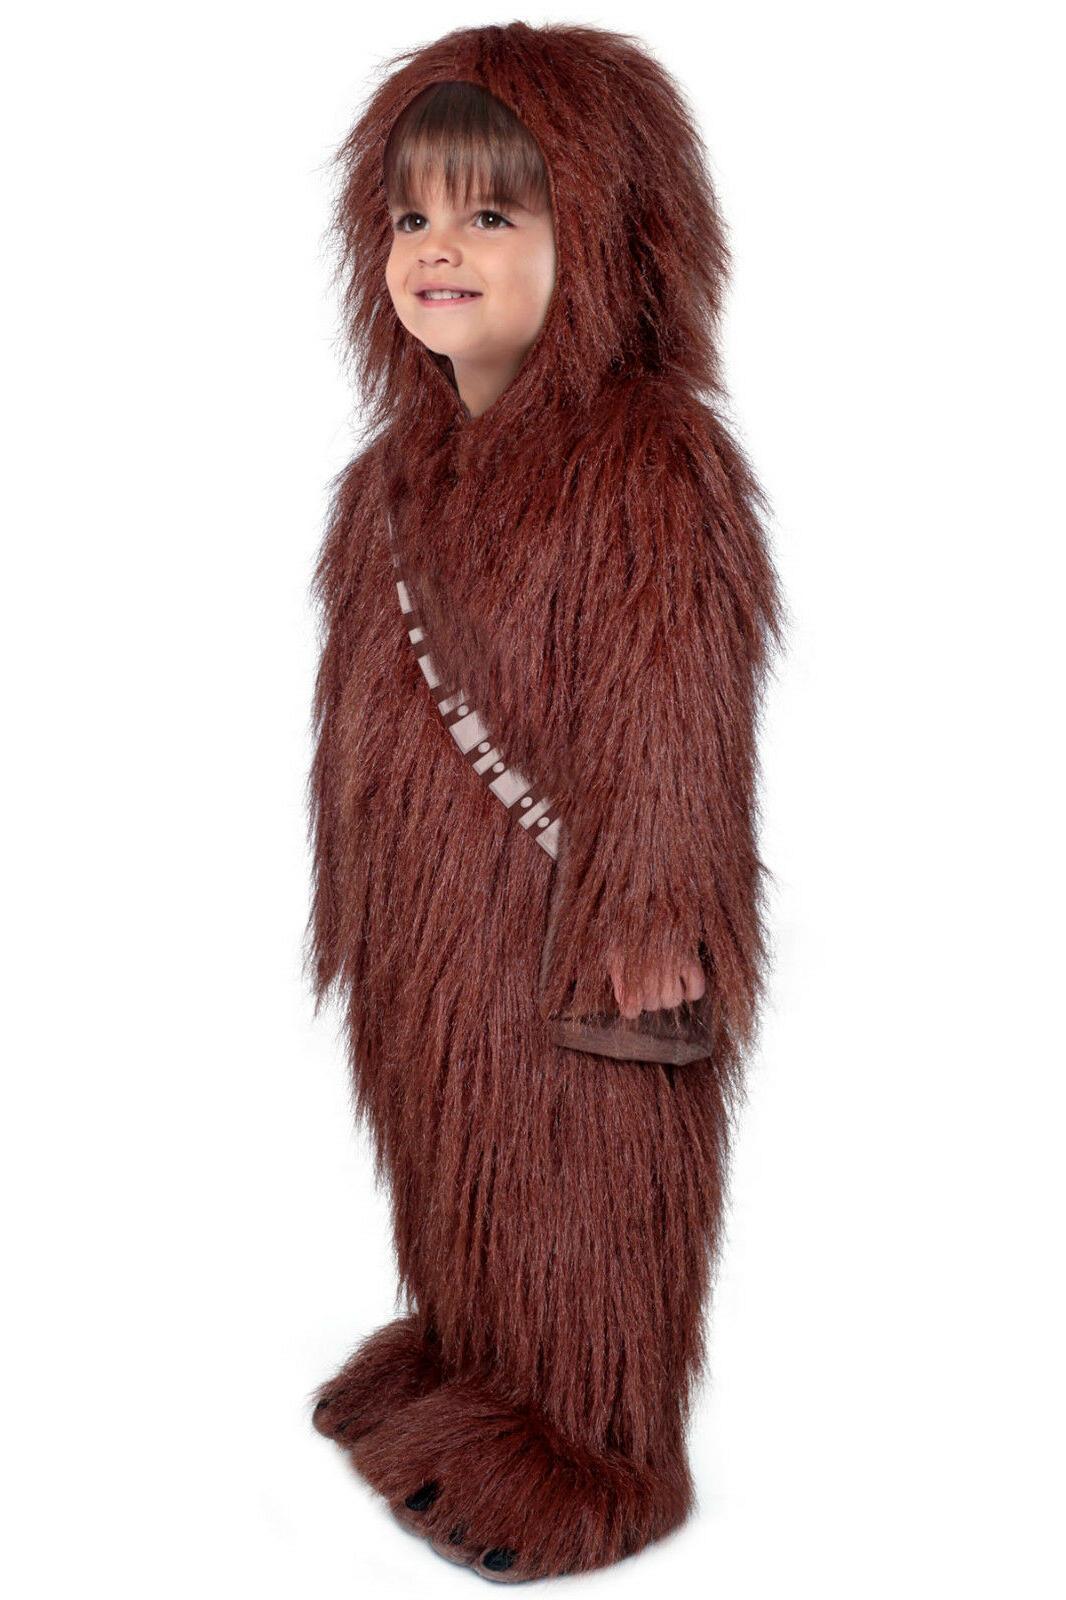 Chewbacca Wookie Chewie Deluxe Star Kids Child Costume 4T 3 4